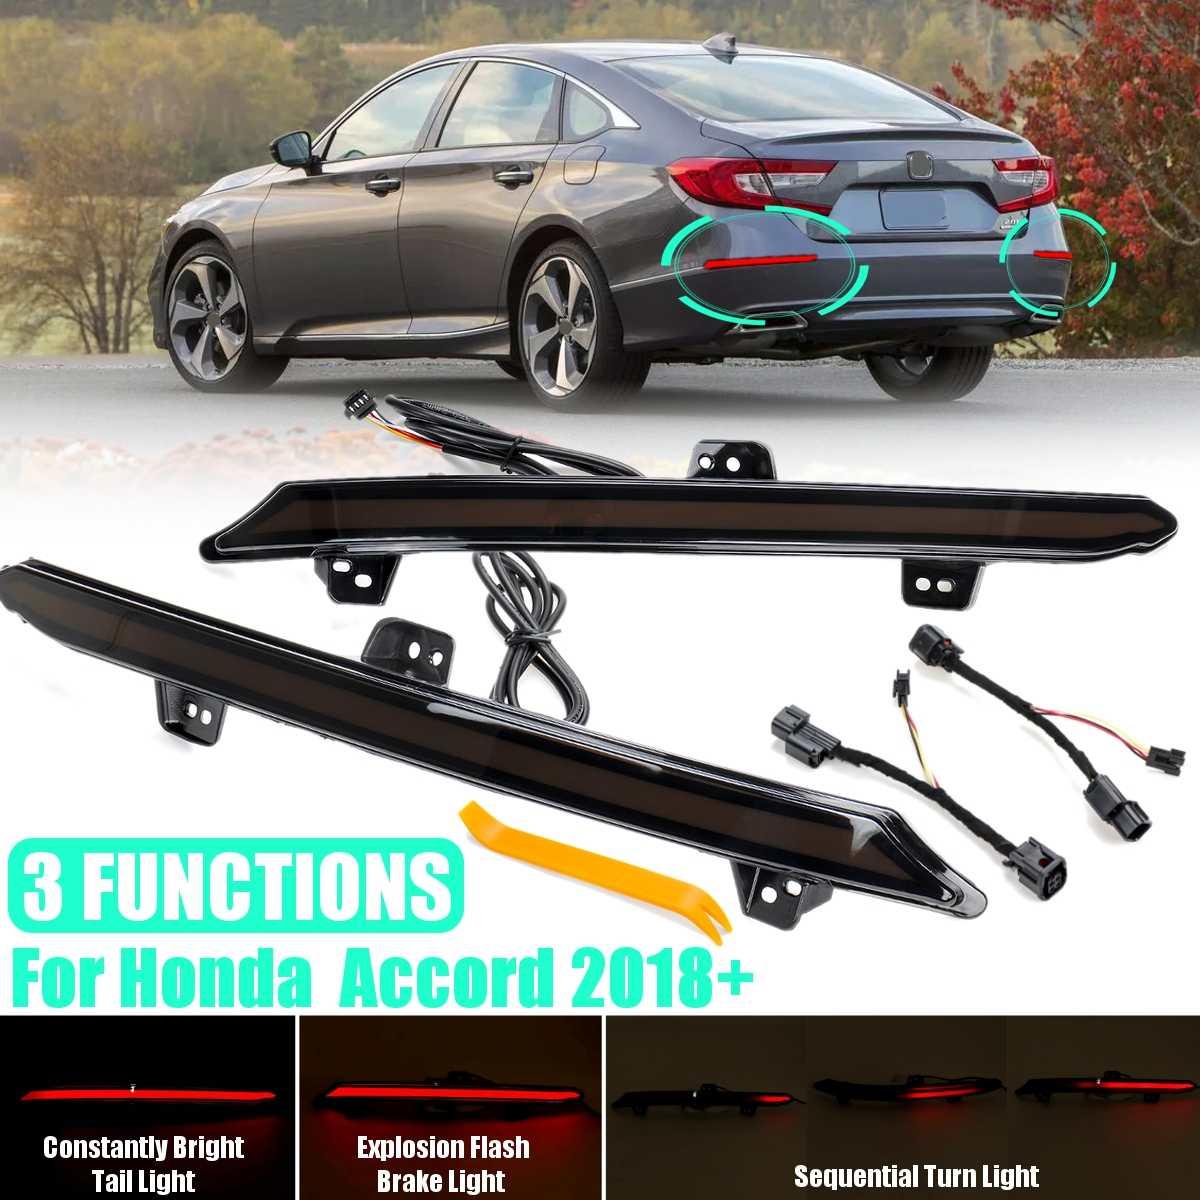 Led Smoke Reflector Light for Honda Accord 10 10th 2018 2019 2020 Car Rear Bumper Tail Light Brake Turn Signal Light Accessories